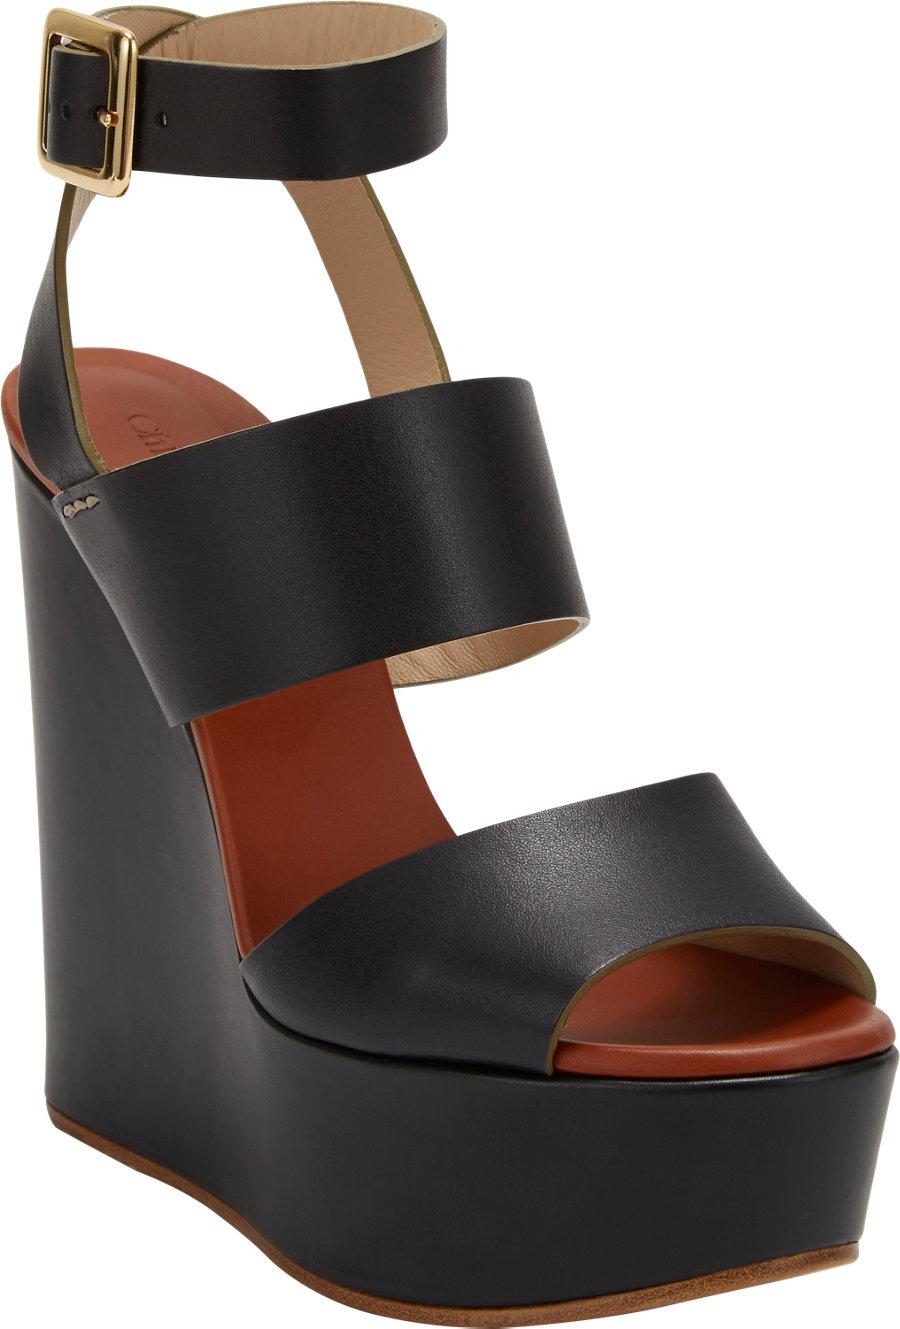 Chlo 233 Doublestrap Platform Wedge Sandals In Black Lyst